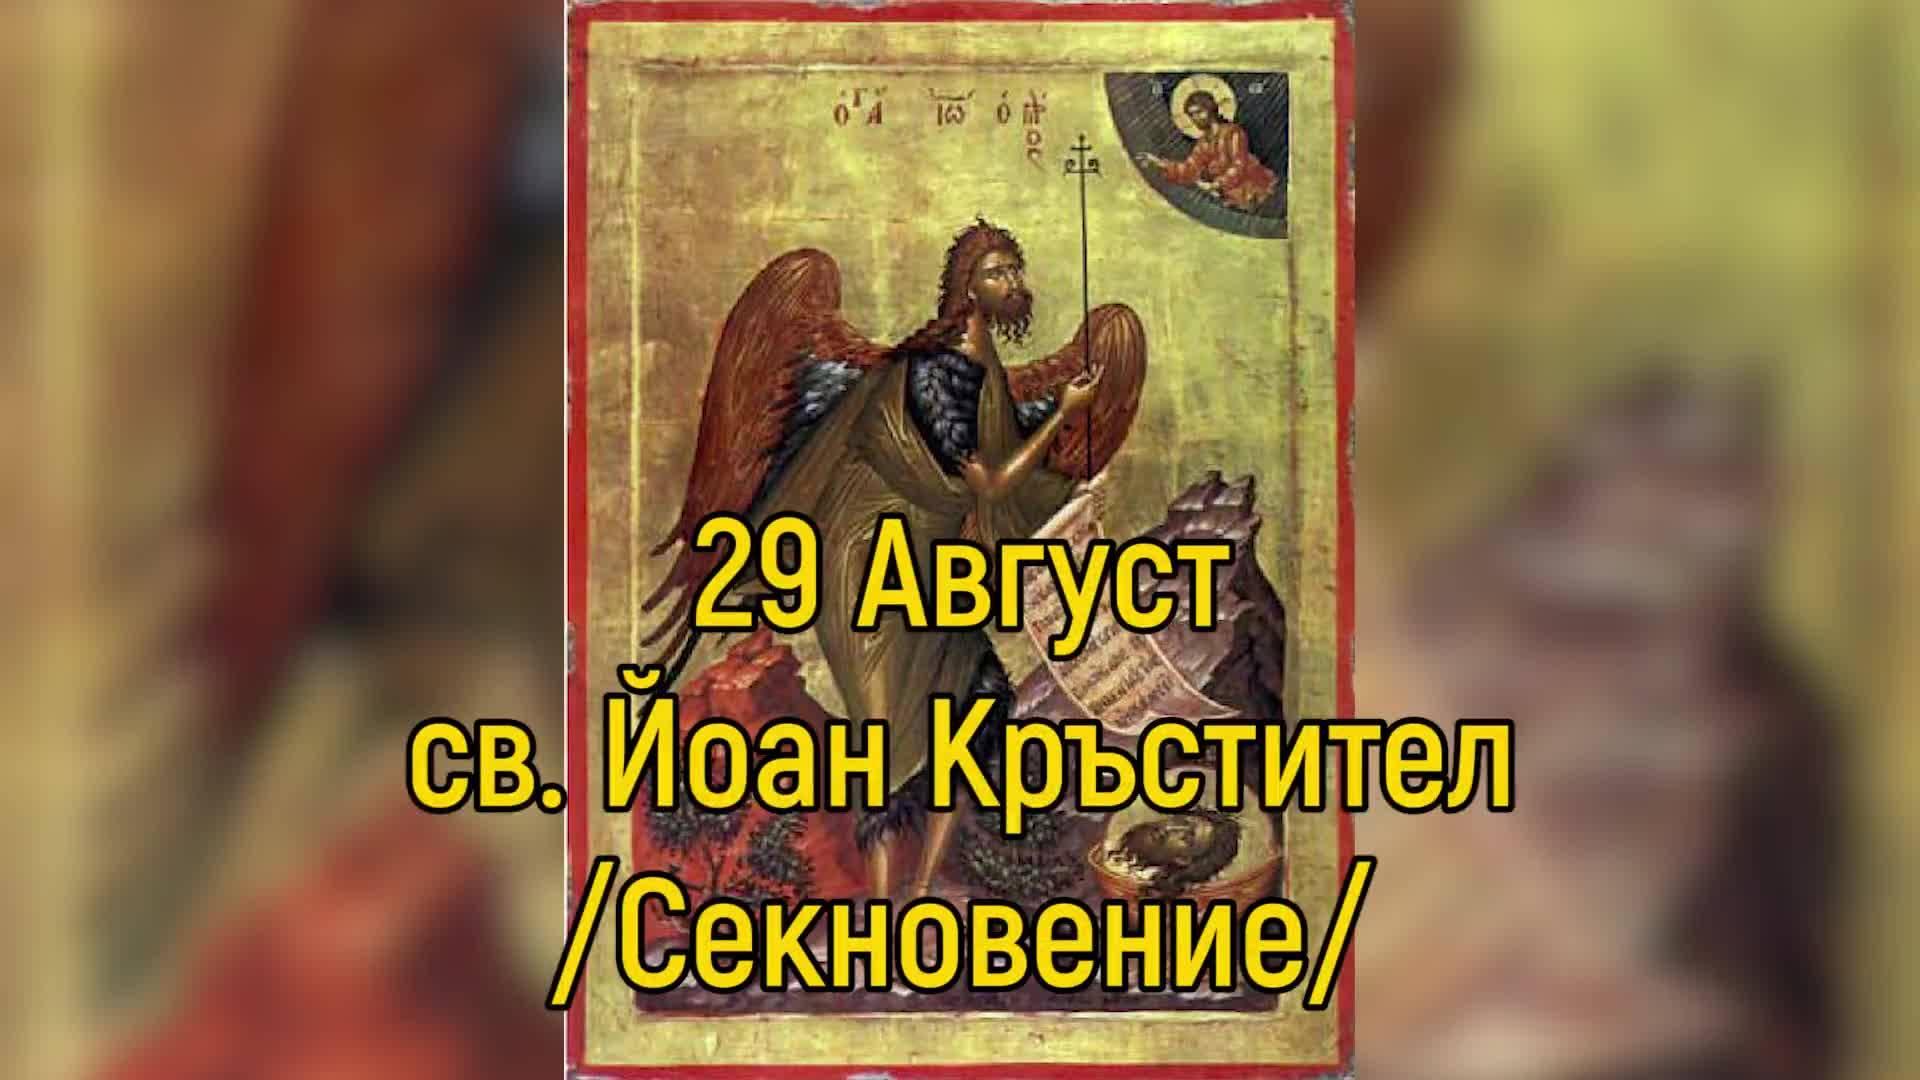 29 Август - св. Йоан Кръстител /Секновение/